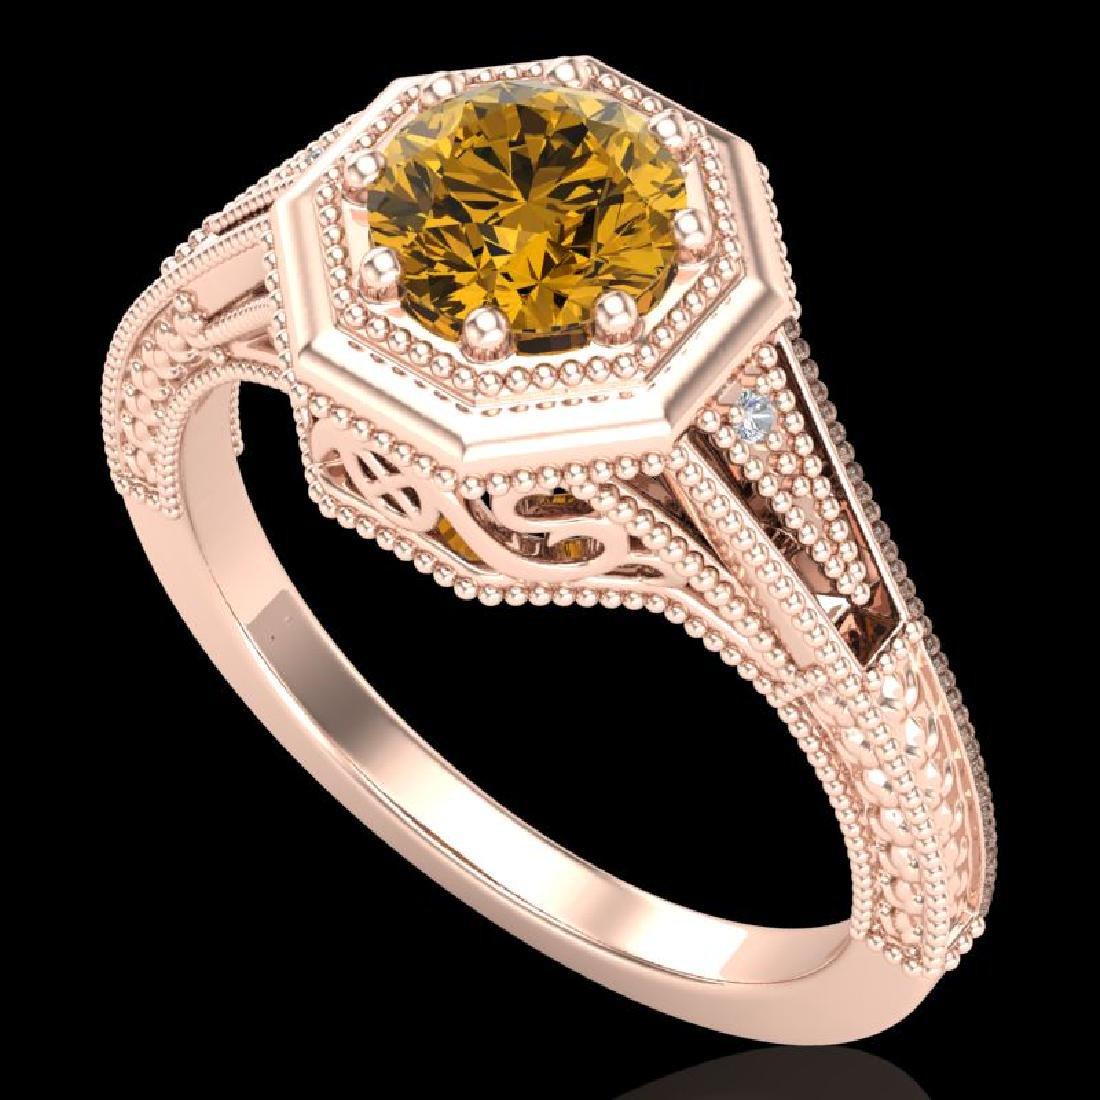 0.84 CTW Intense Fancy Yellow Diamond Engagement Art